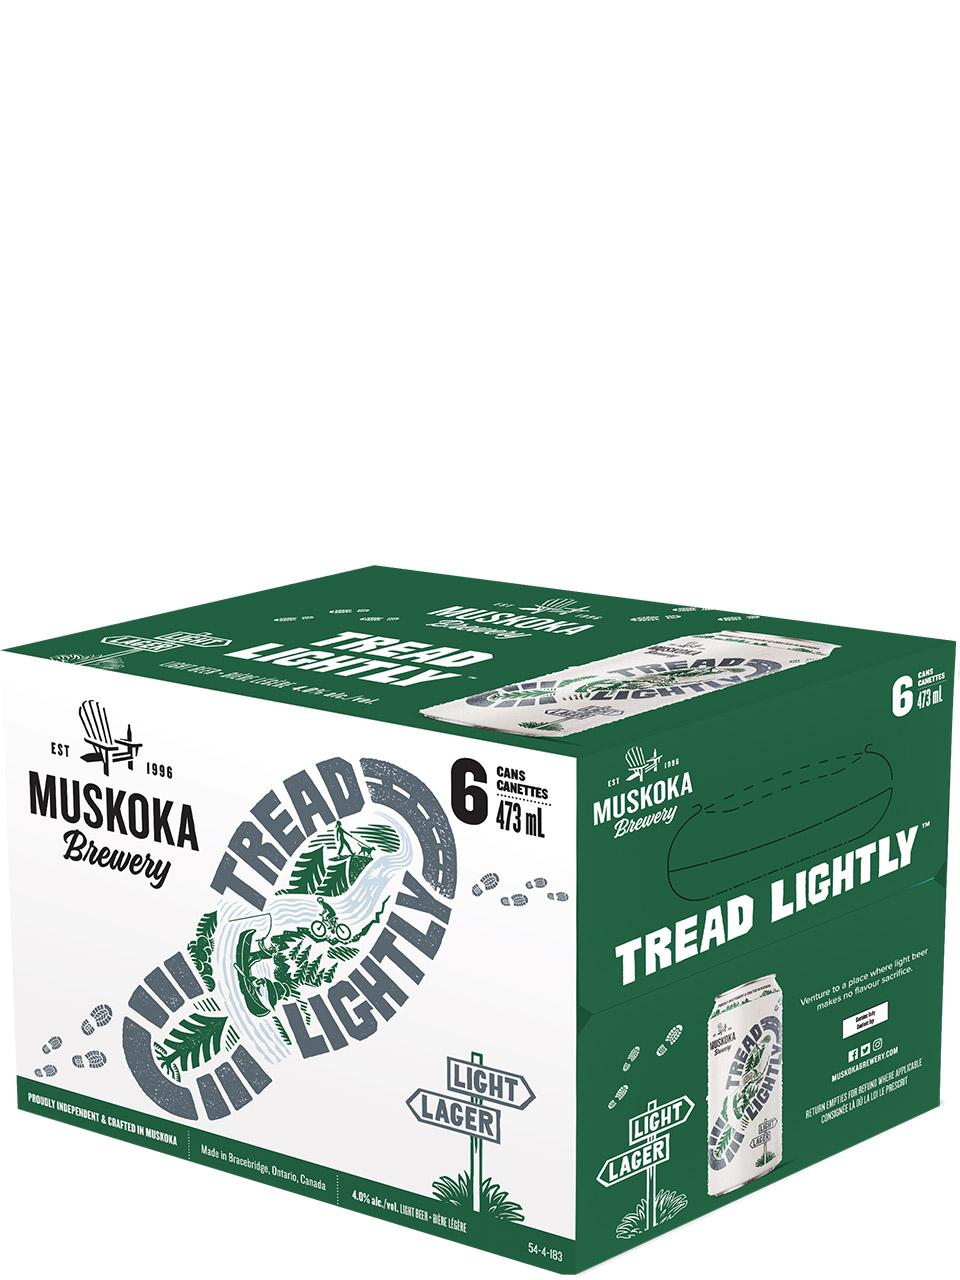 Muskoka Tread Lightly Light Lager 6 Pack Cans